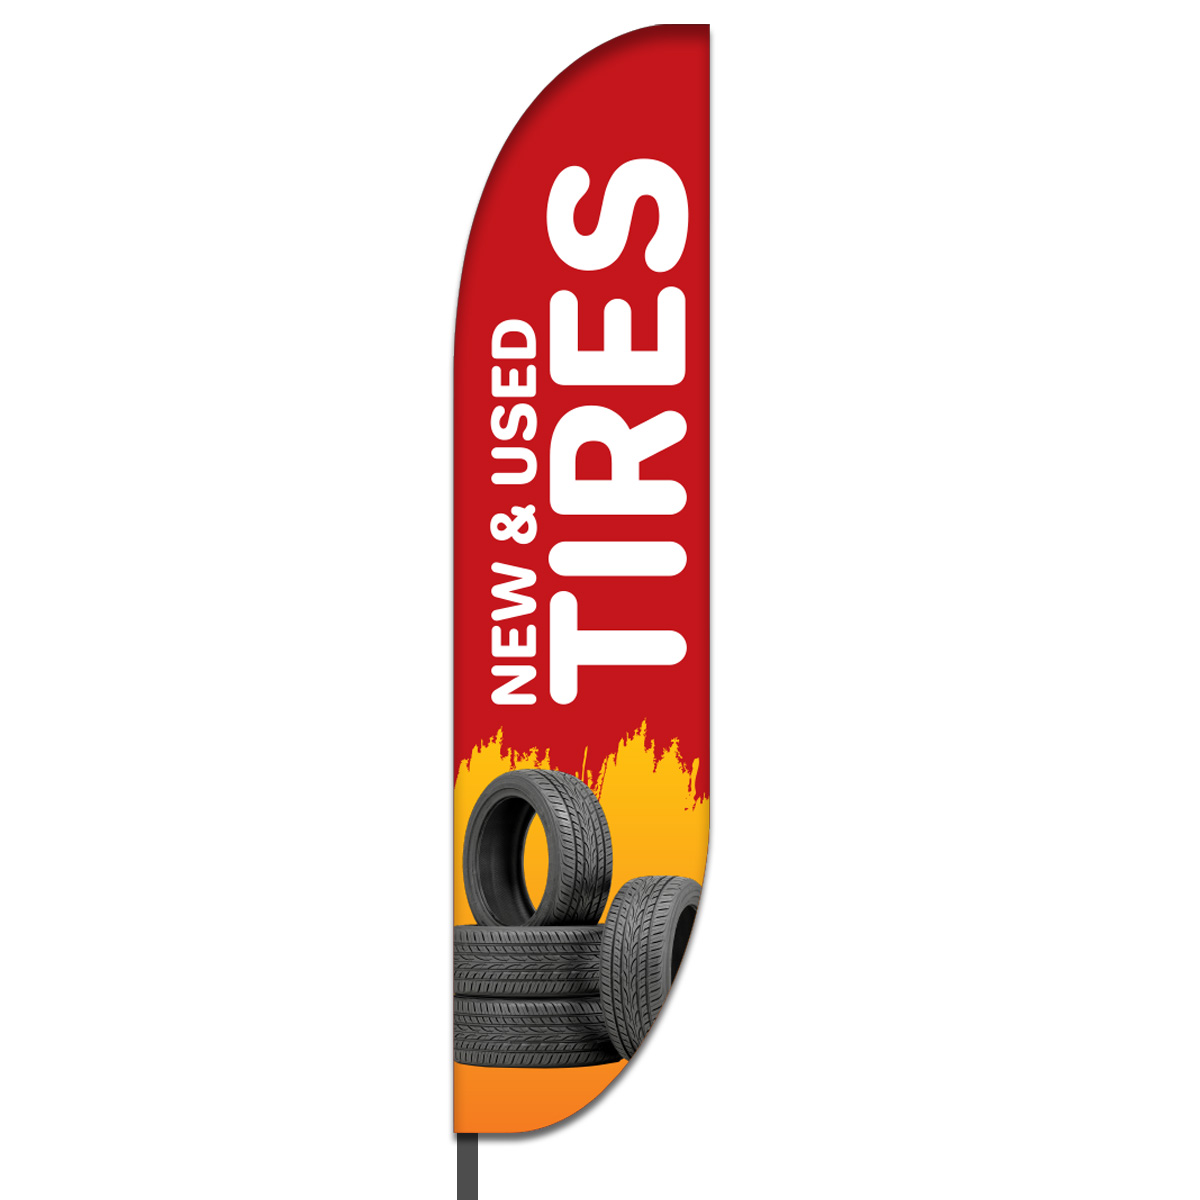 Tire Shop Flag Design 03